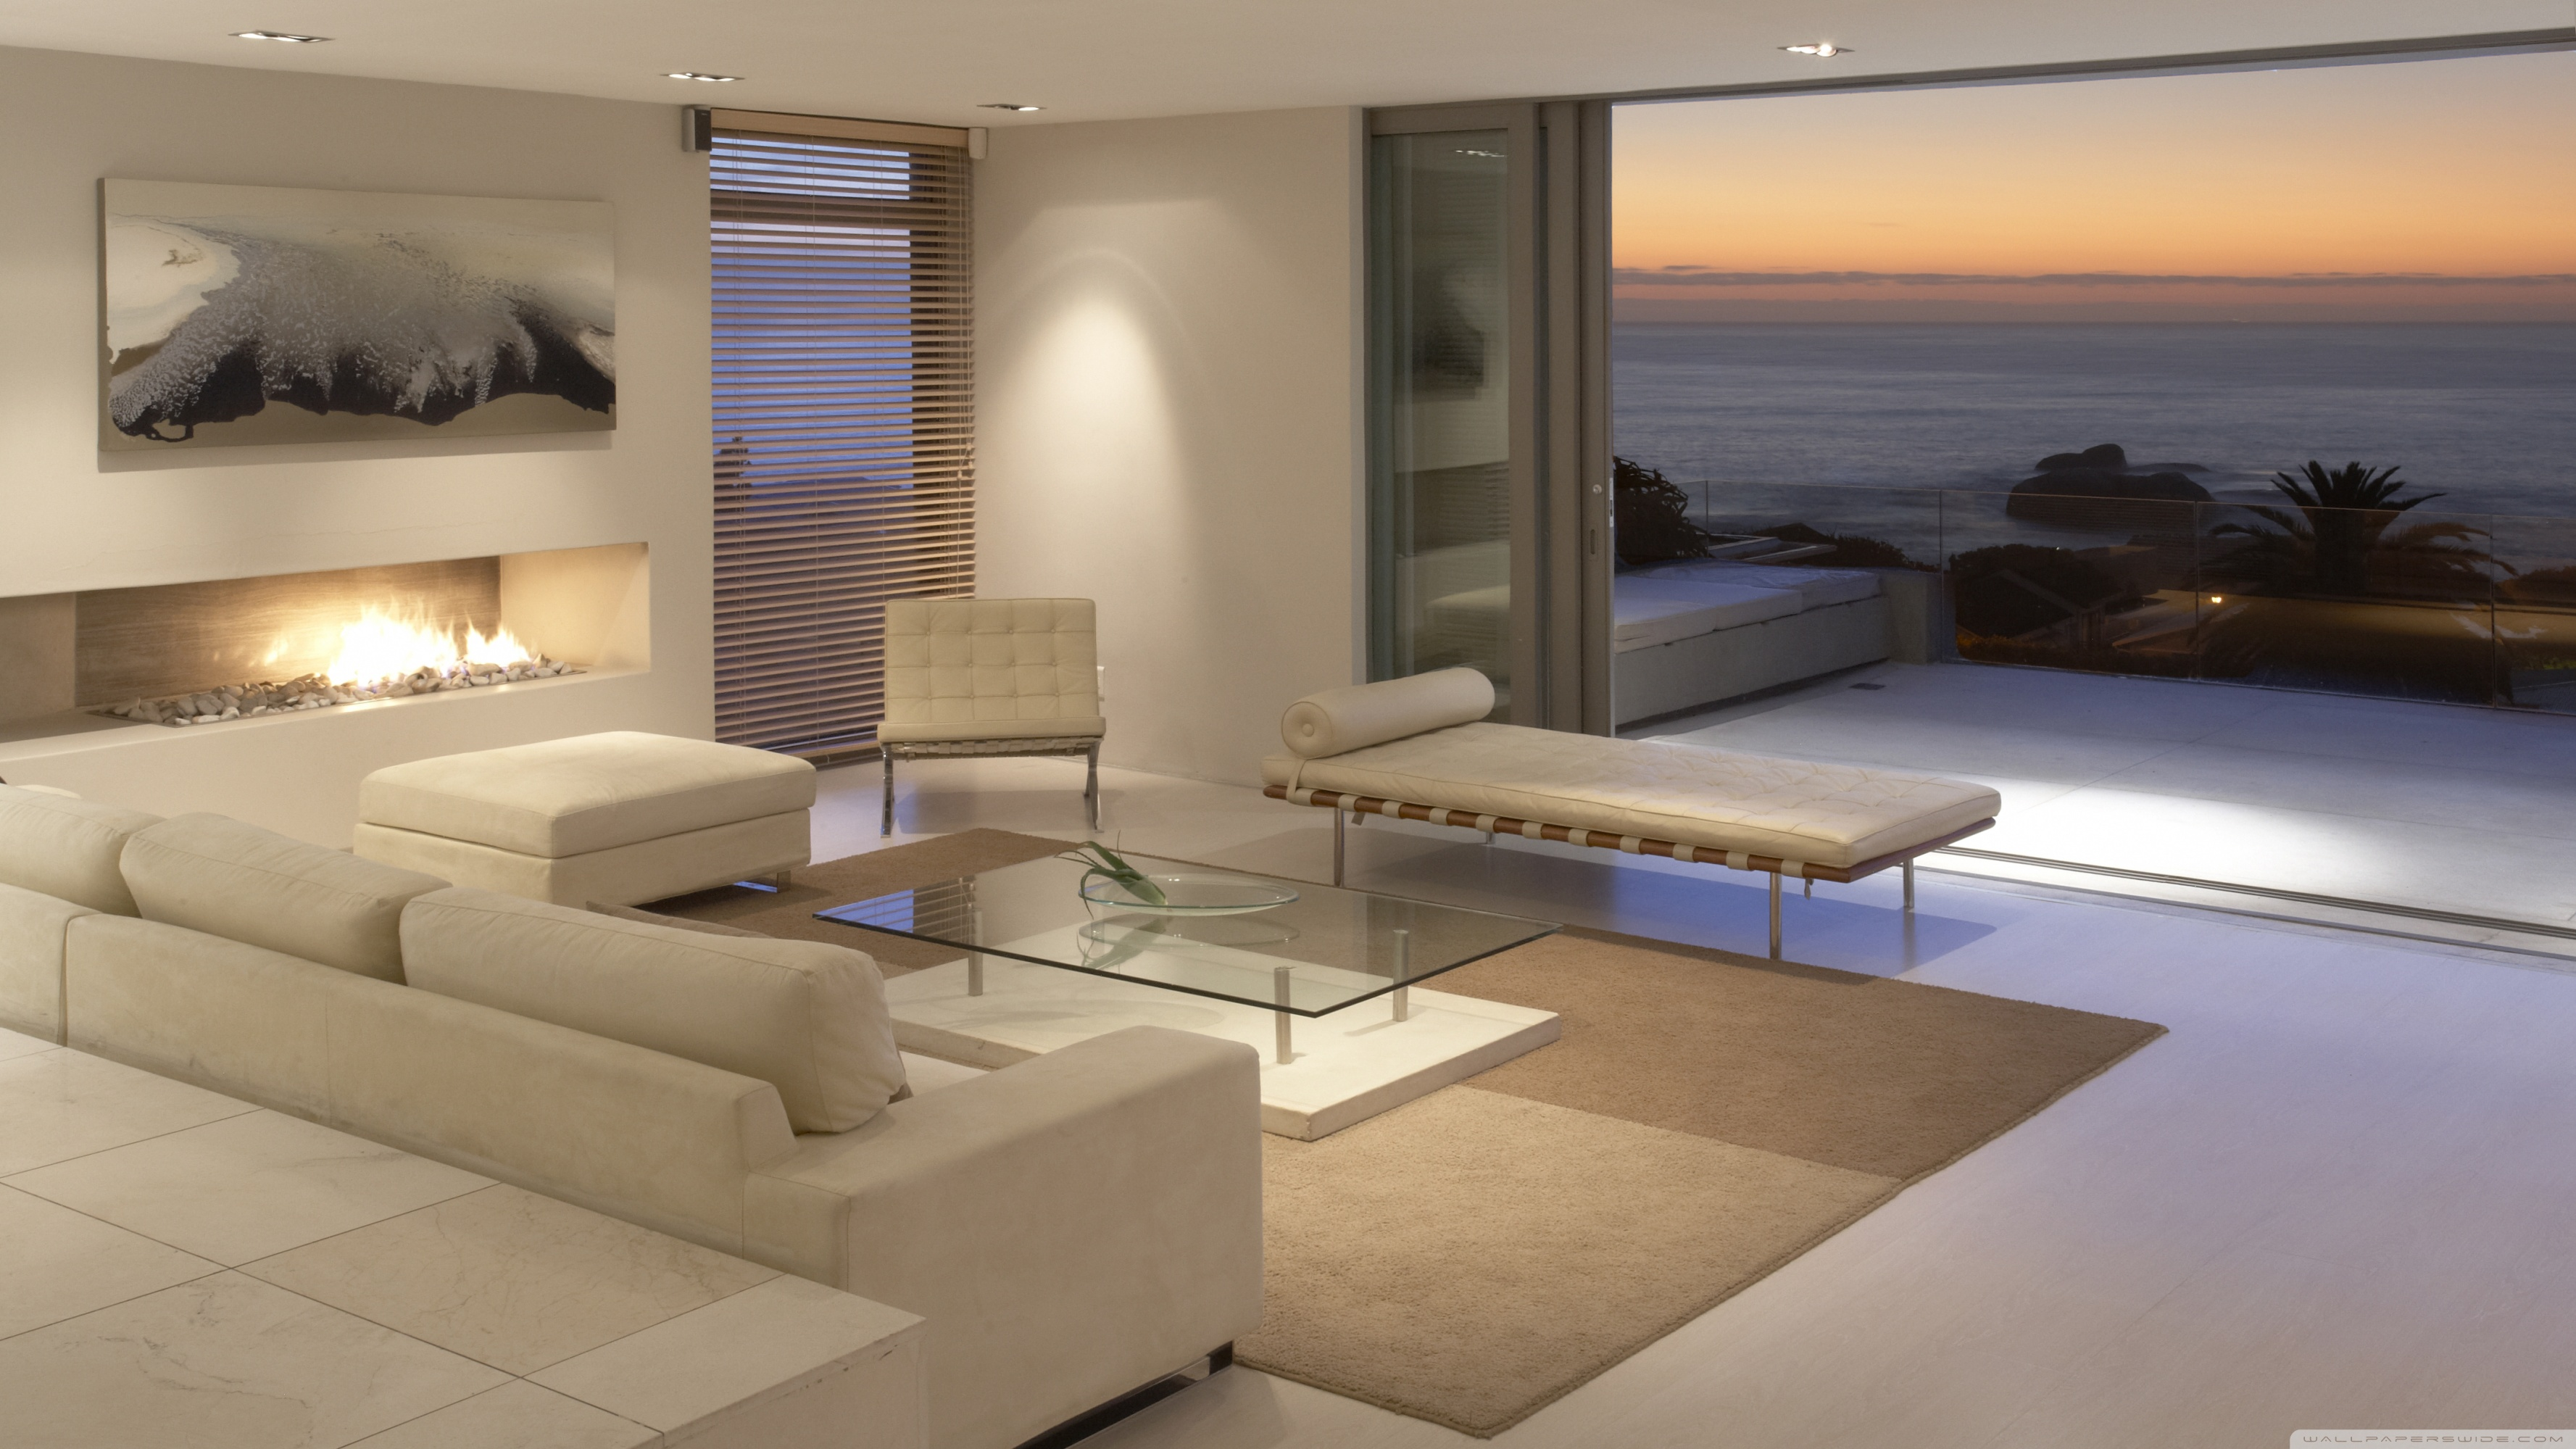 Luxury Vacation Apartment HD desktop wallpaper High Definition 3554x1999